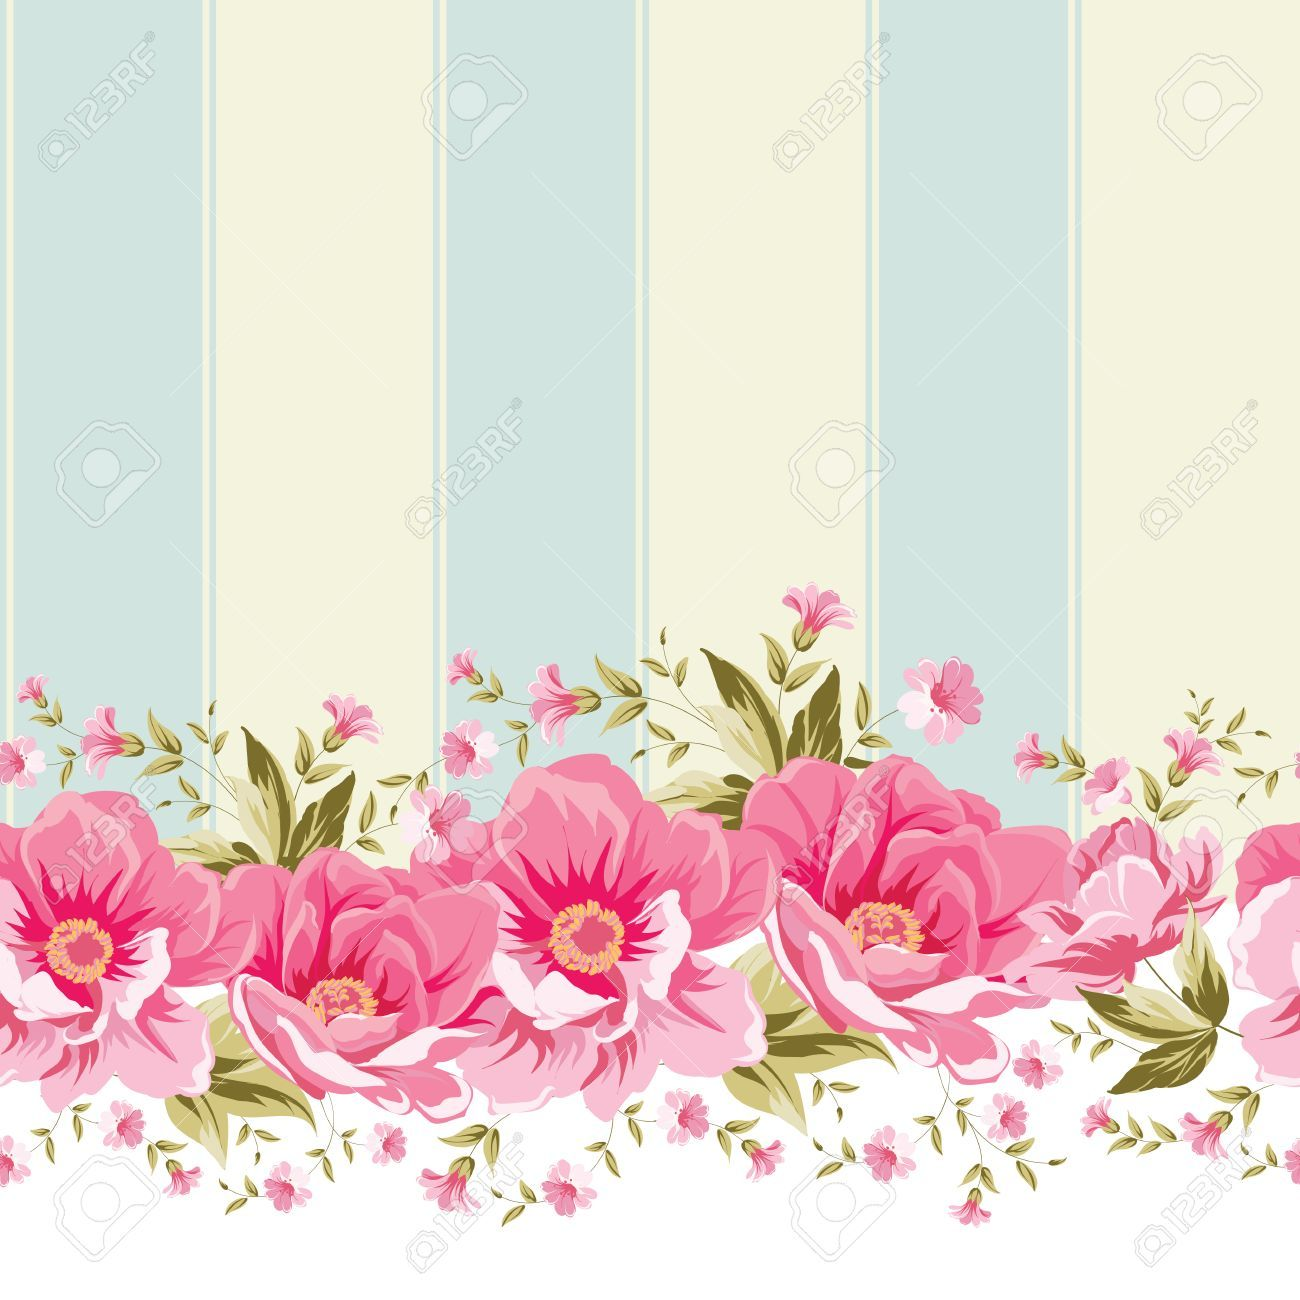 Stock Vector Vintage flowers wallpaper, Vintage flower